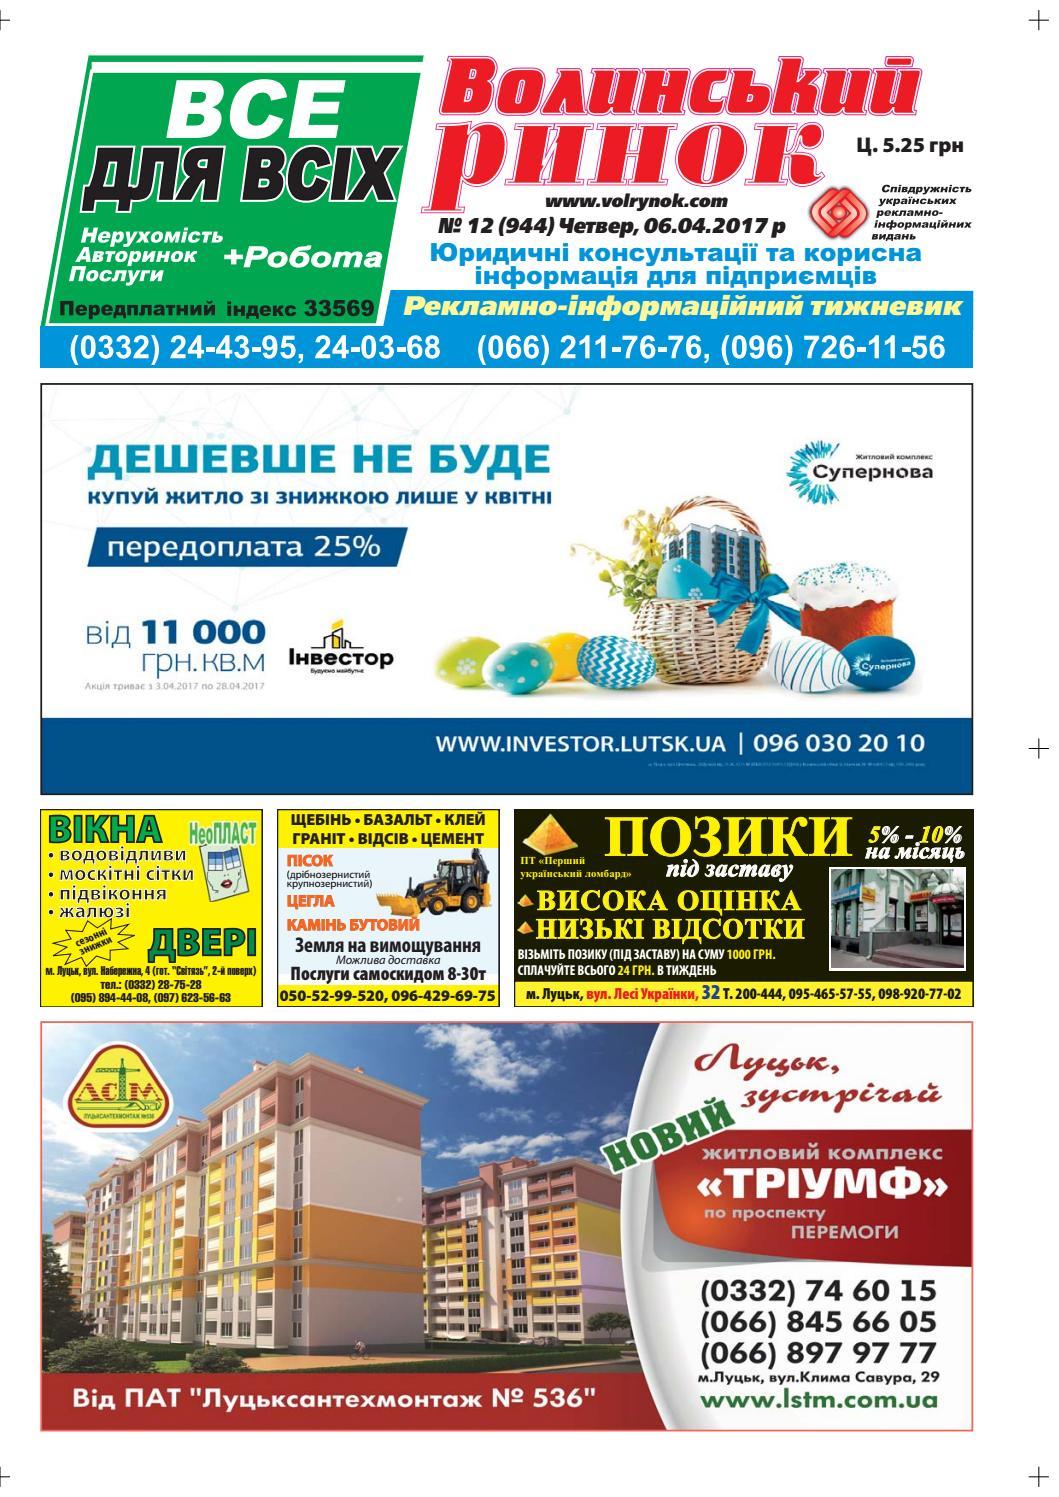 Газета №12 06. 04. 2017 by volrynok - issuu e980f74a72ae8